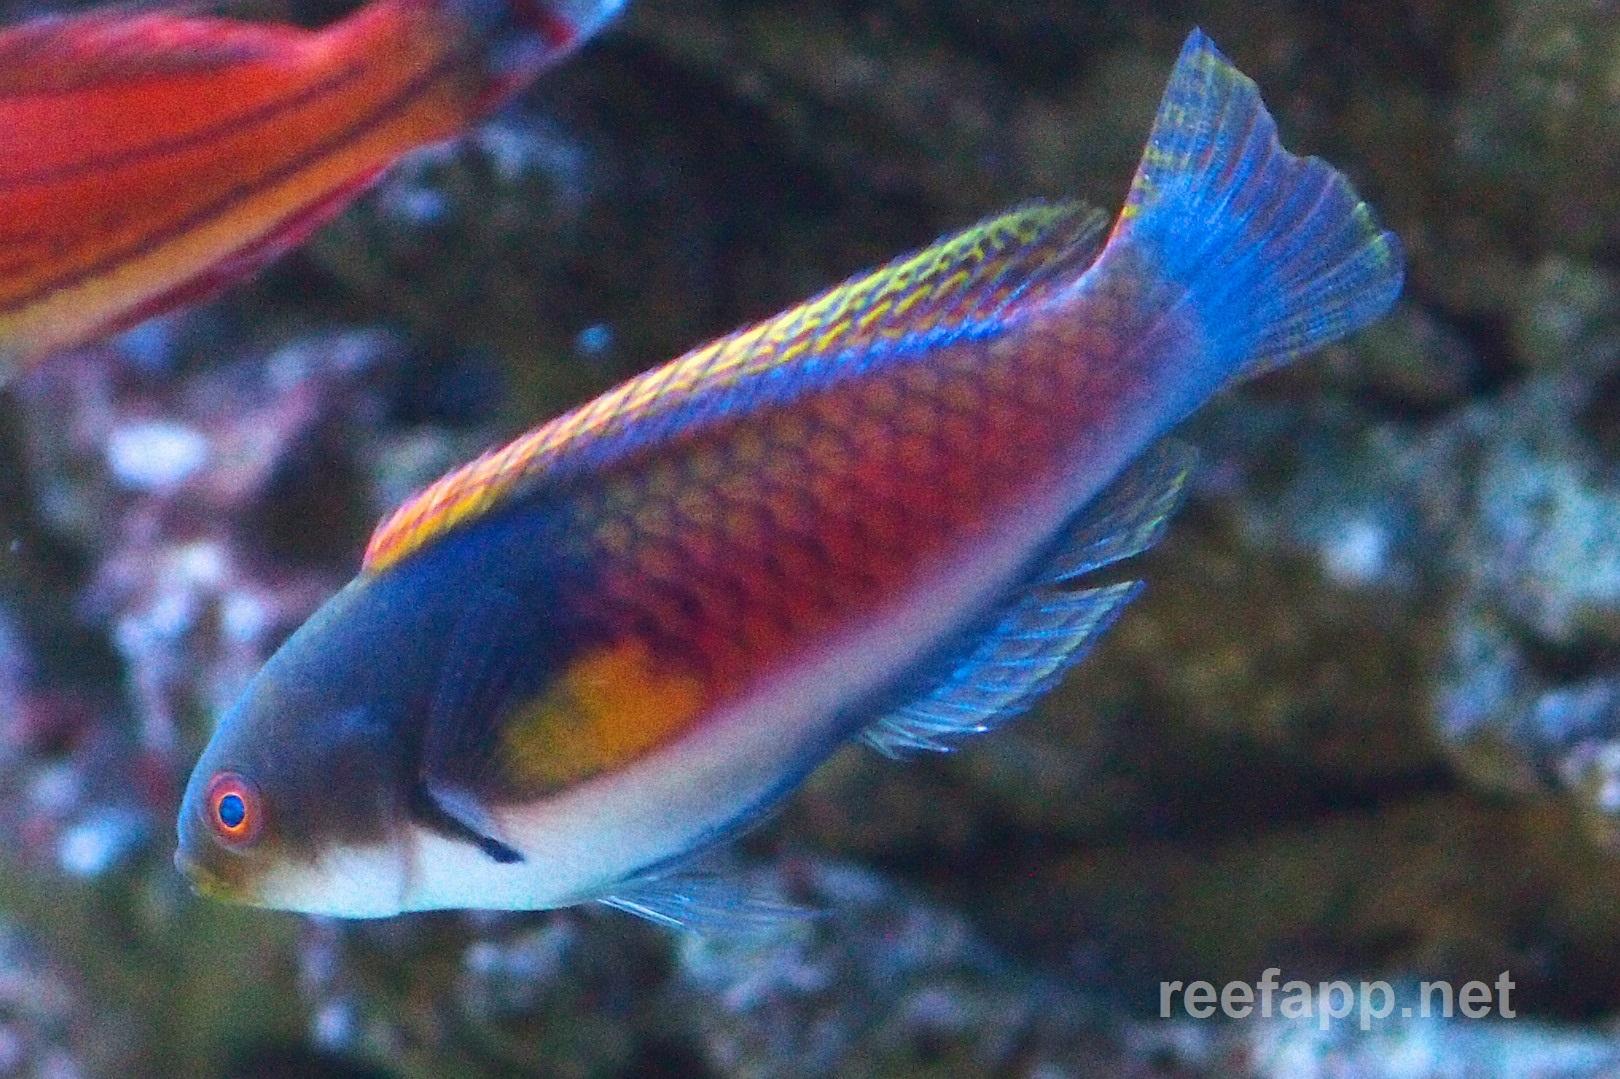 Blueside wrasse (Cirrhilabrus cyanopleura) in aquarium